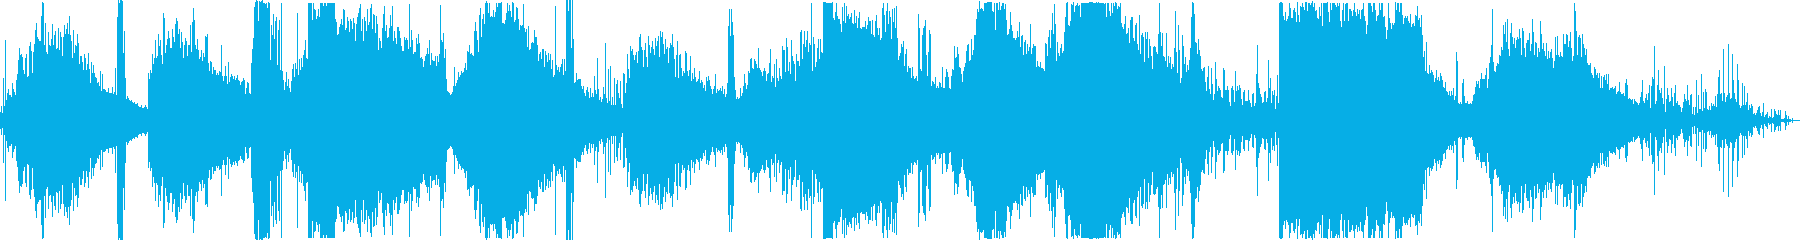 【SF映画シーン】 プログラム操作の再生済みの波形